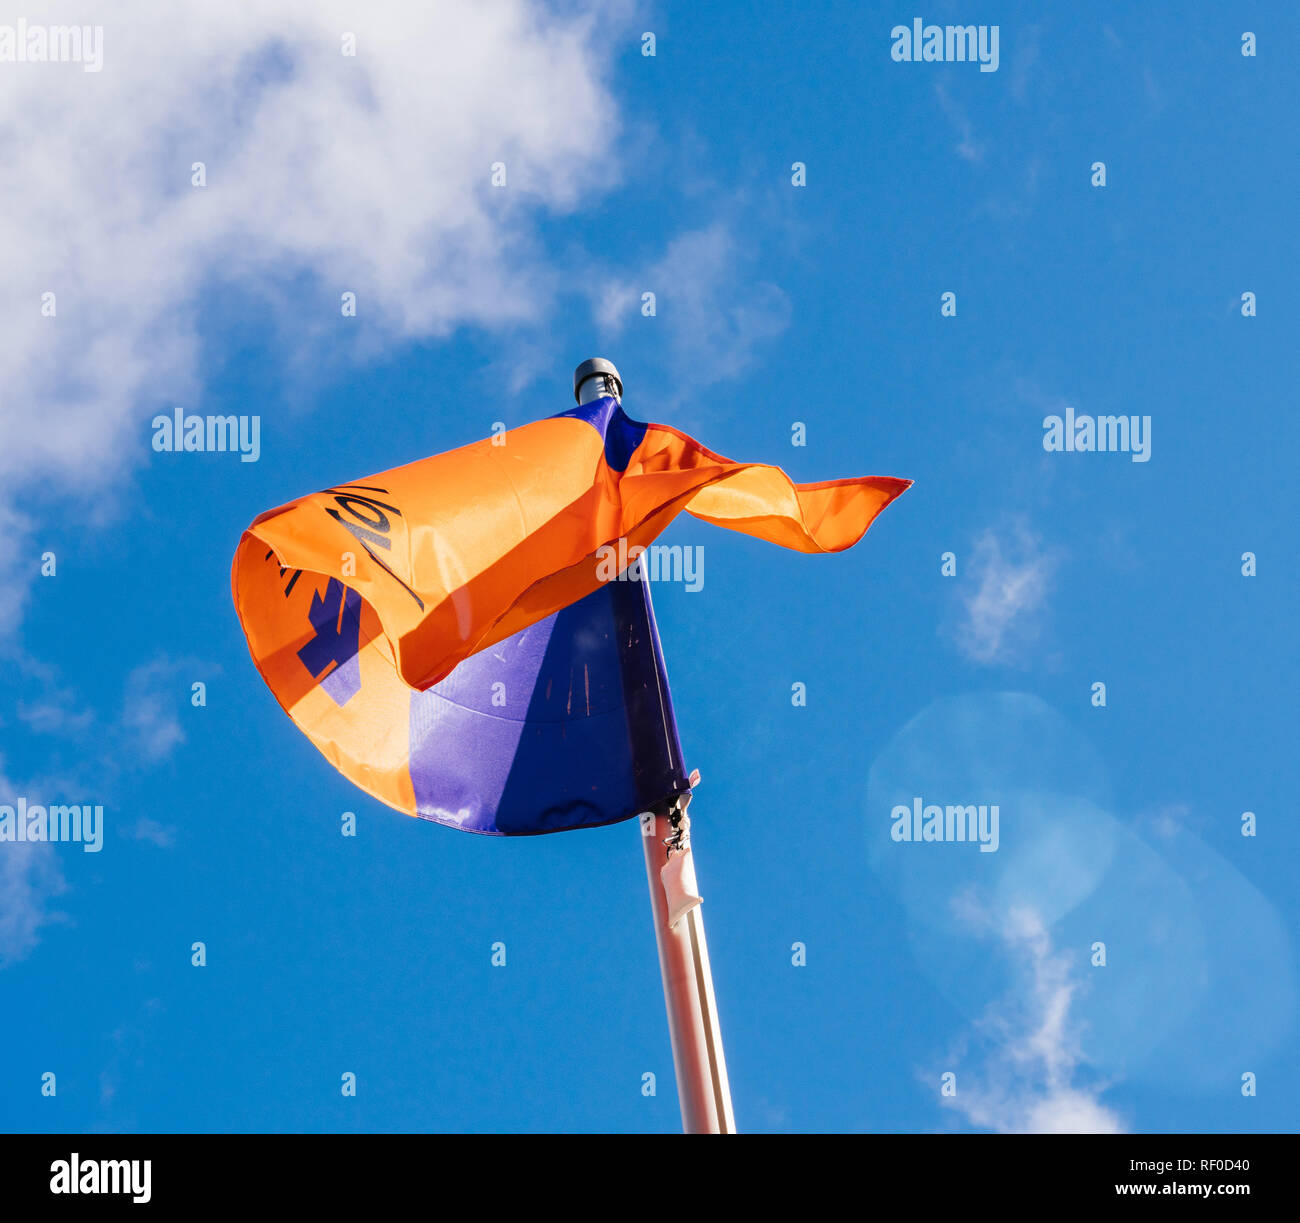 HAMBURG, GERMANY - MAR 20, 2018: Waving Hapag-Lloyd transnational German-based transportation company flag against blue sky - Stock Image